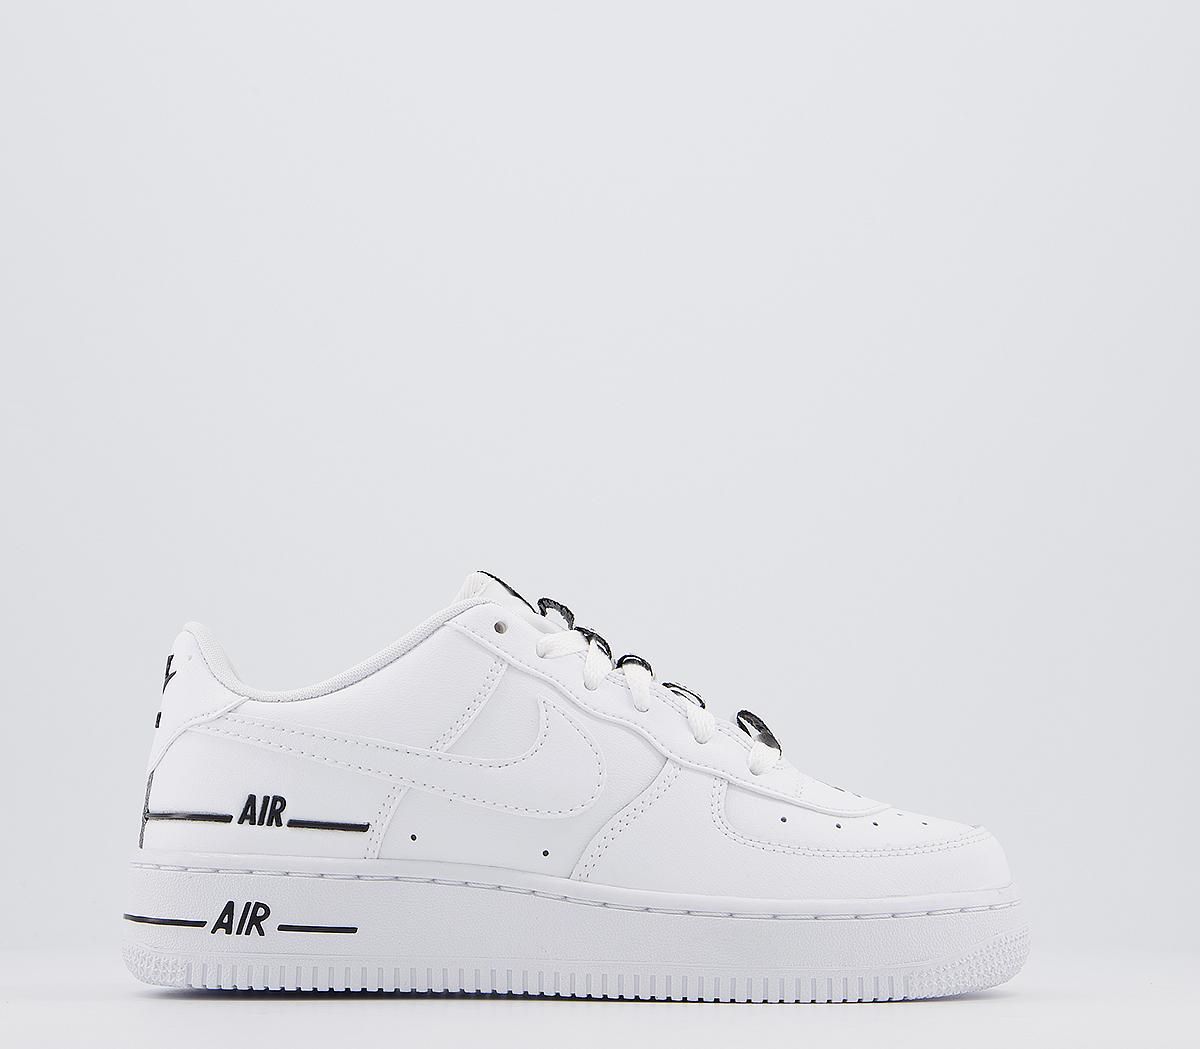 Nike Air Force 1 Trainers White White